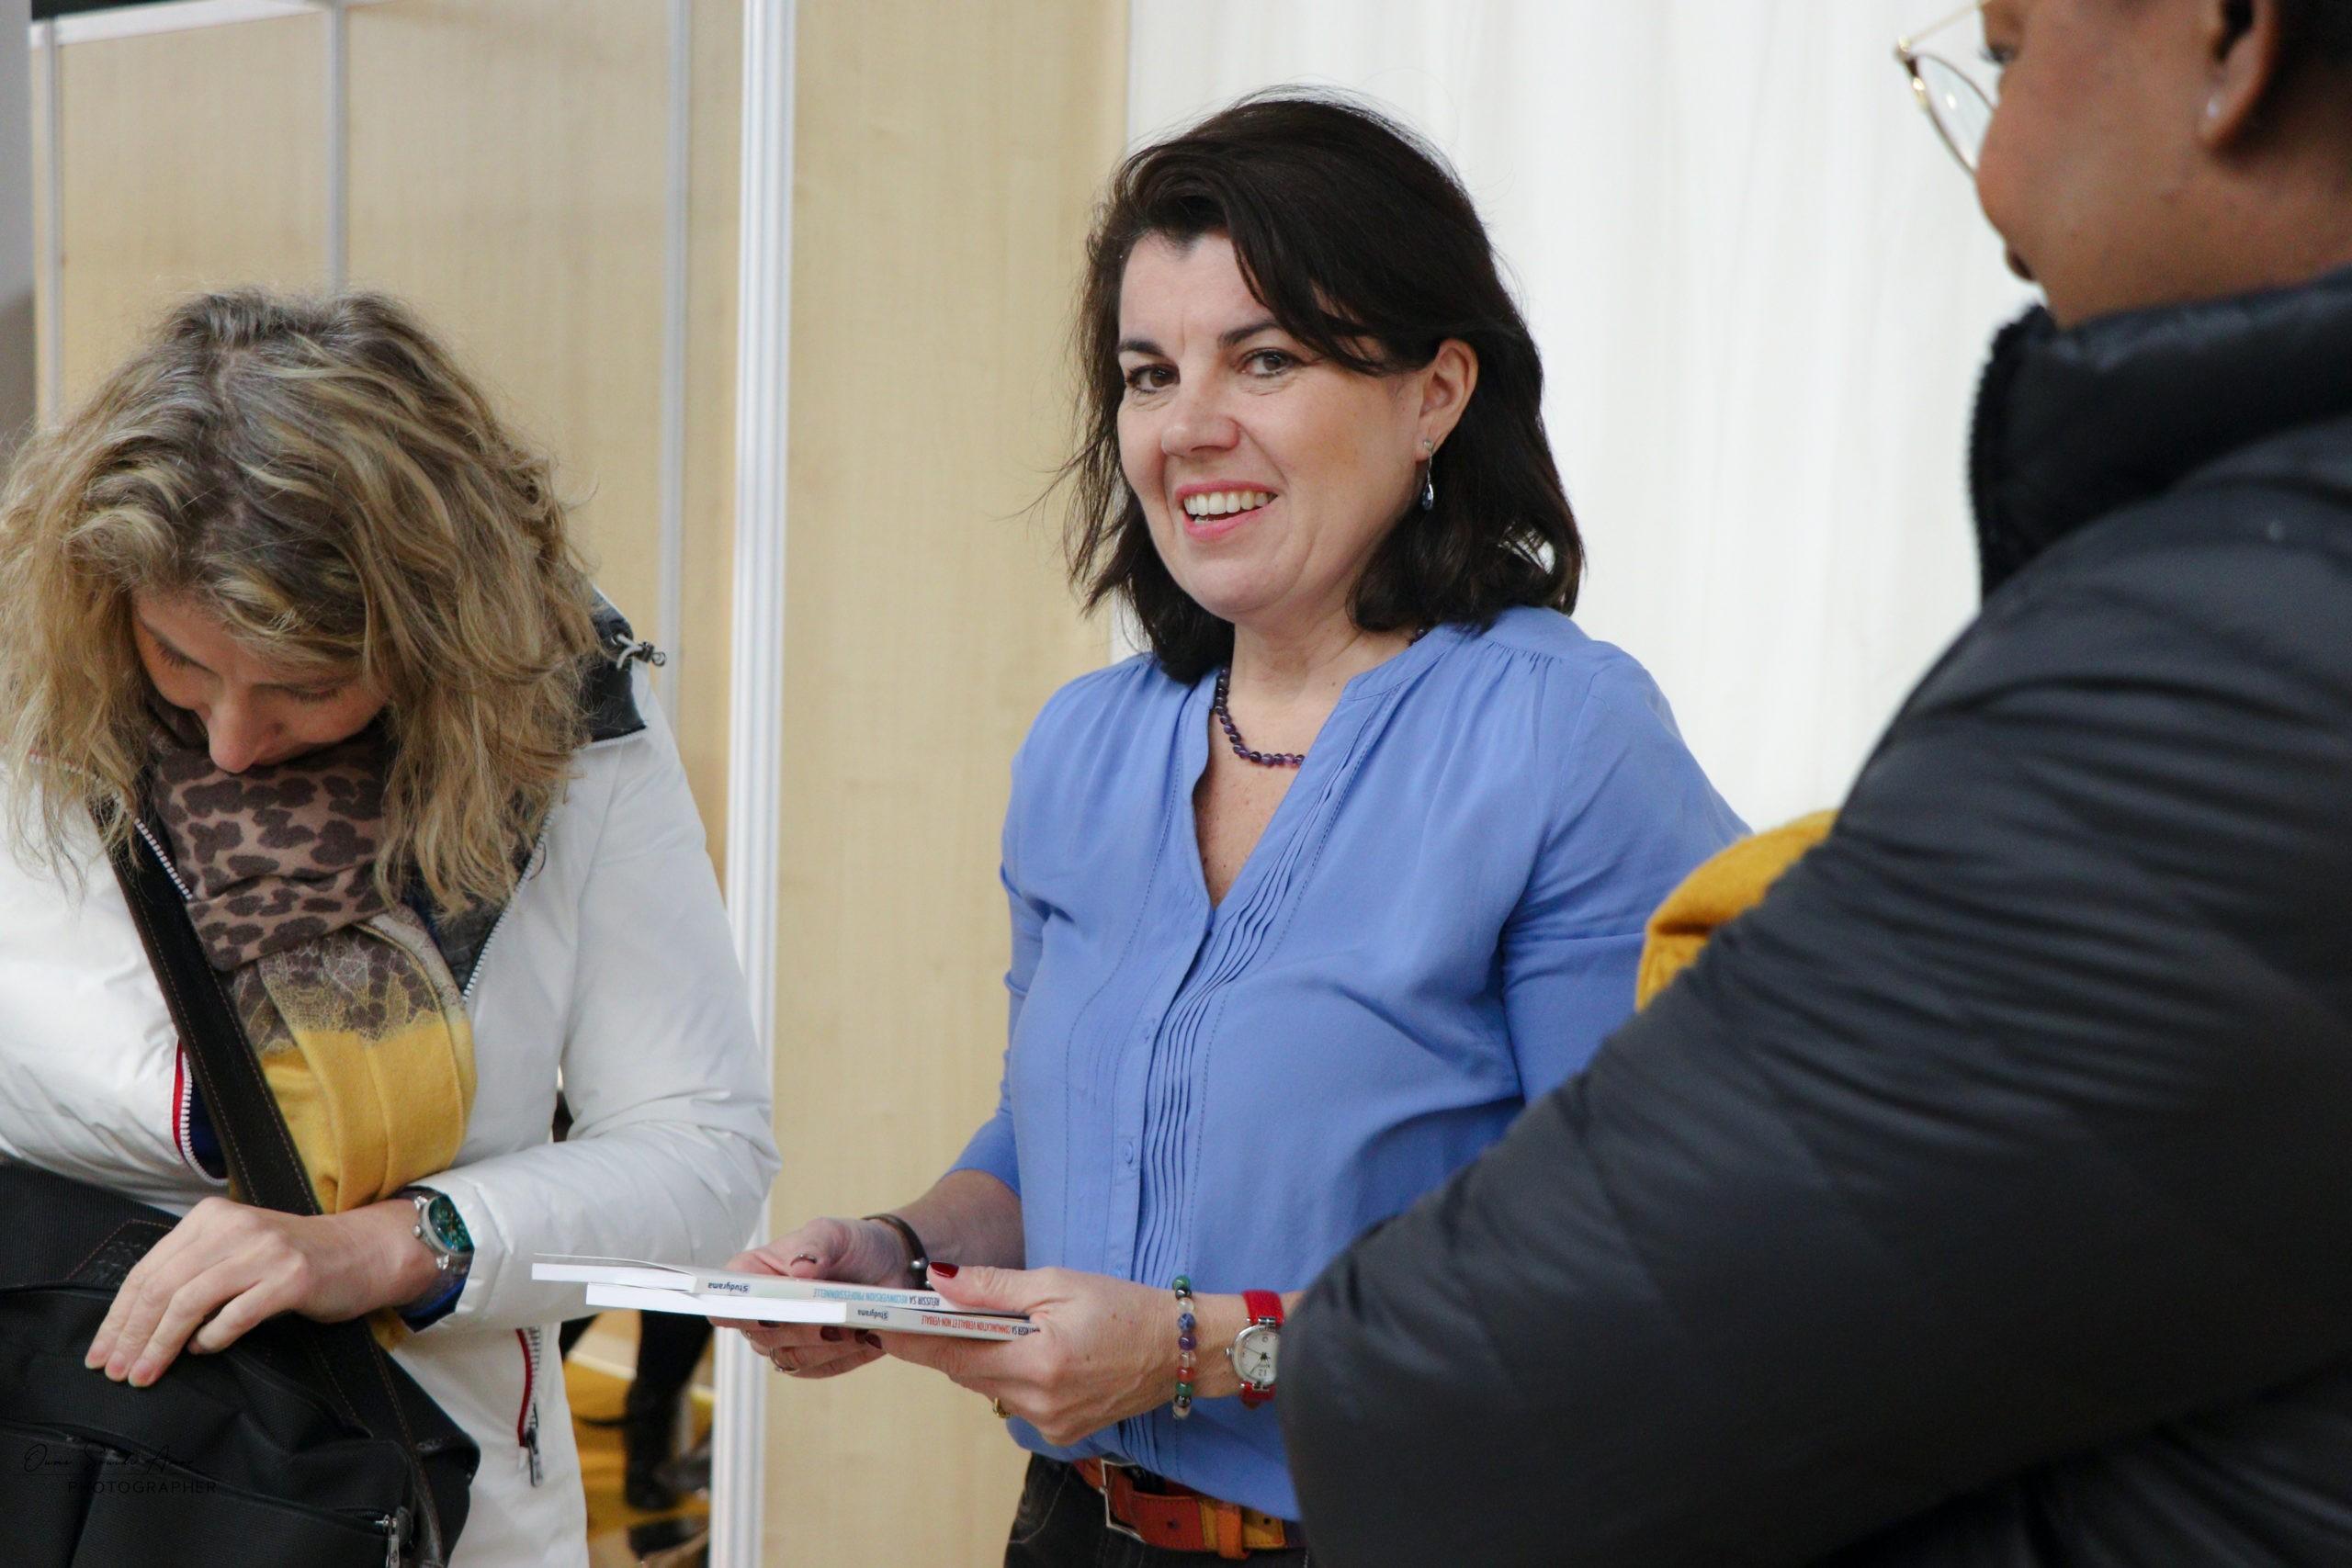 Ana-Fernandez-coach-professionnel-emploi